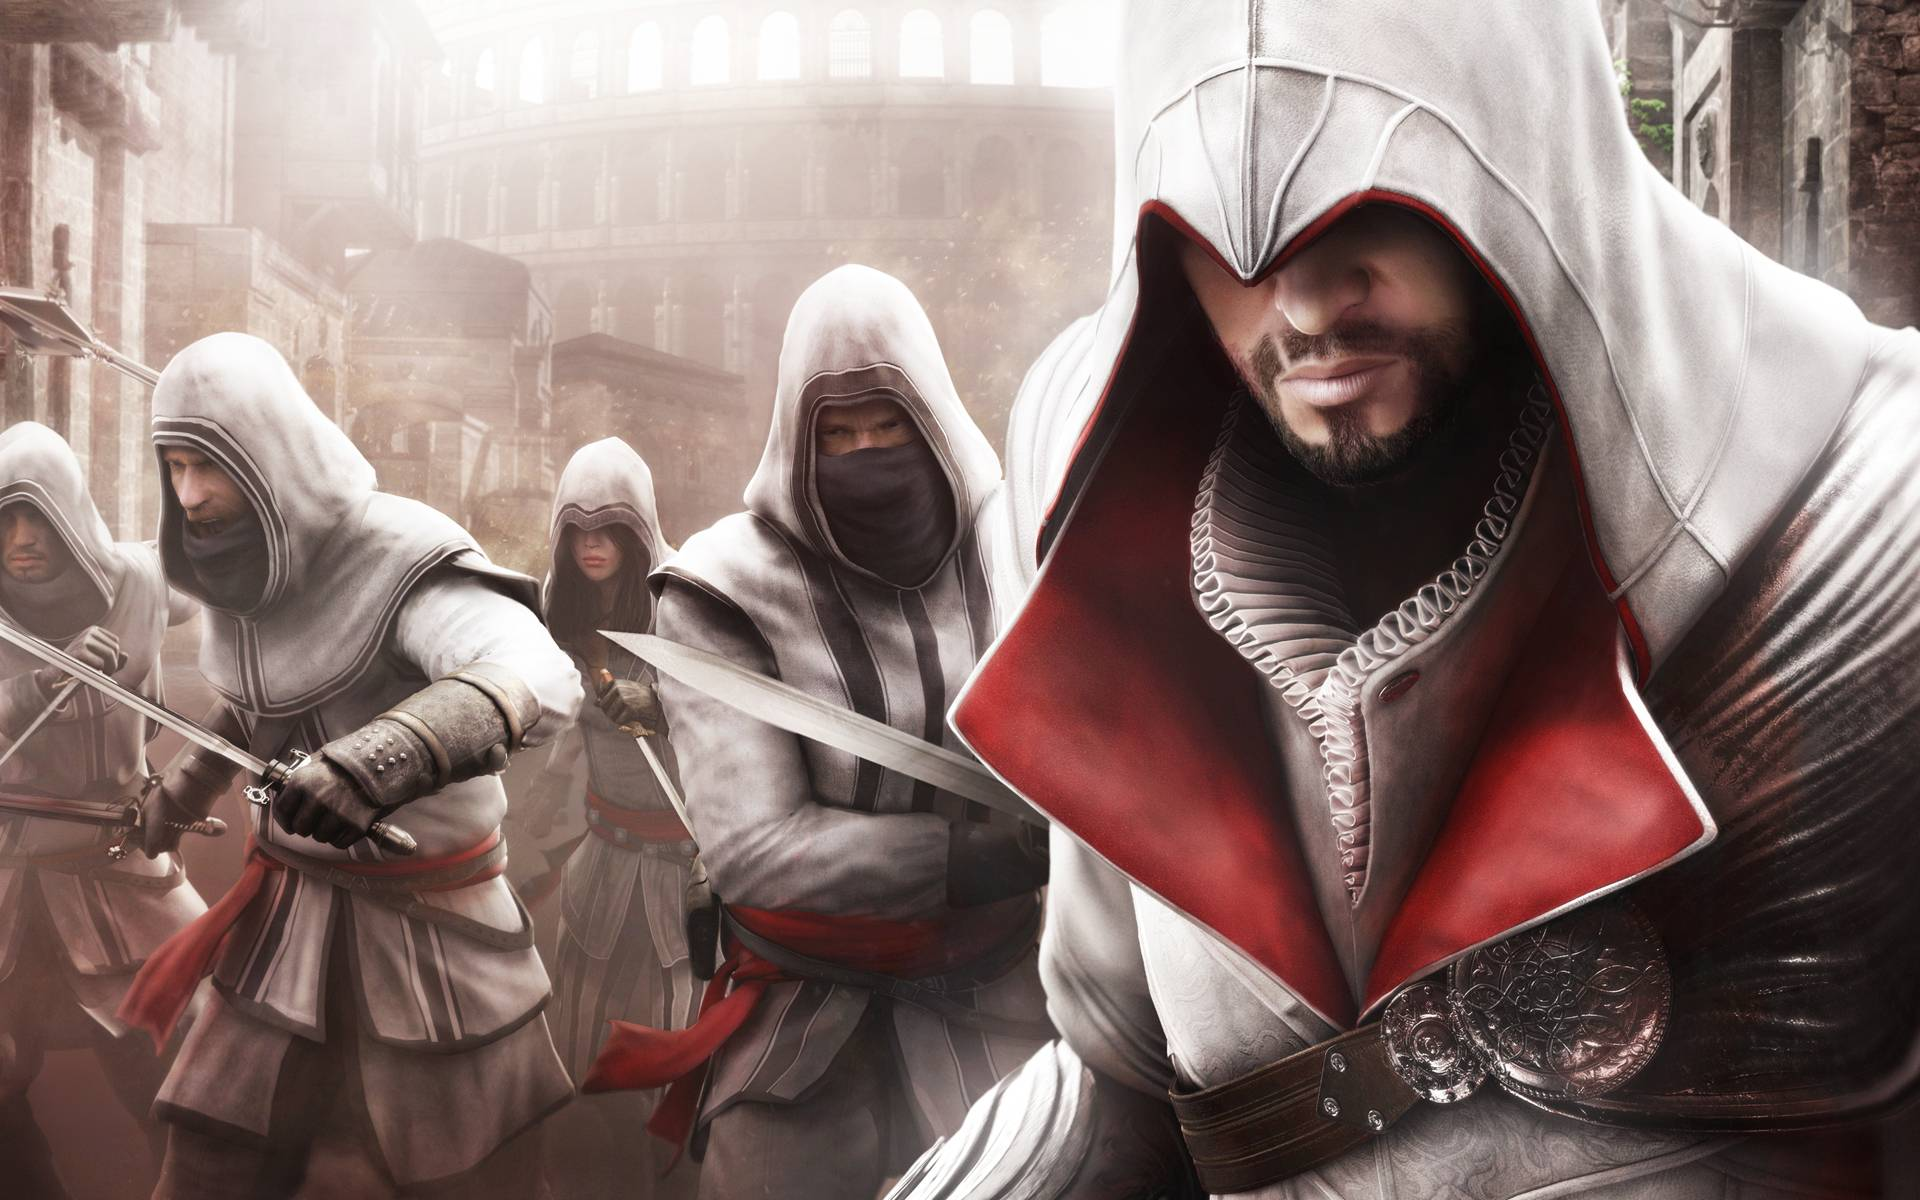 Assassins Creed Ezio Wallpapers Hd: Ezio Wallpapers